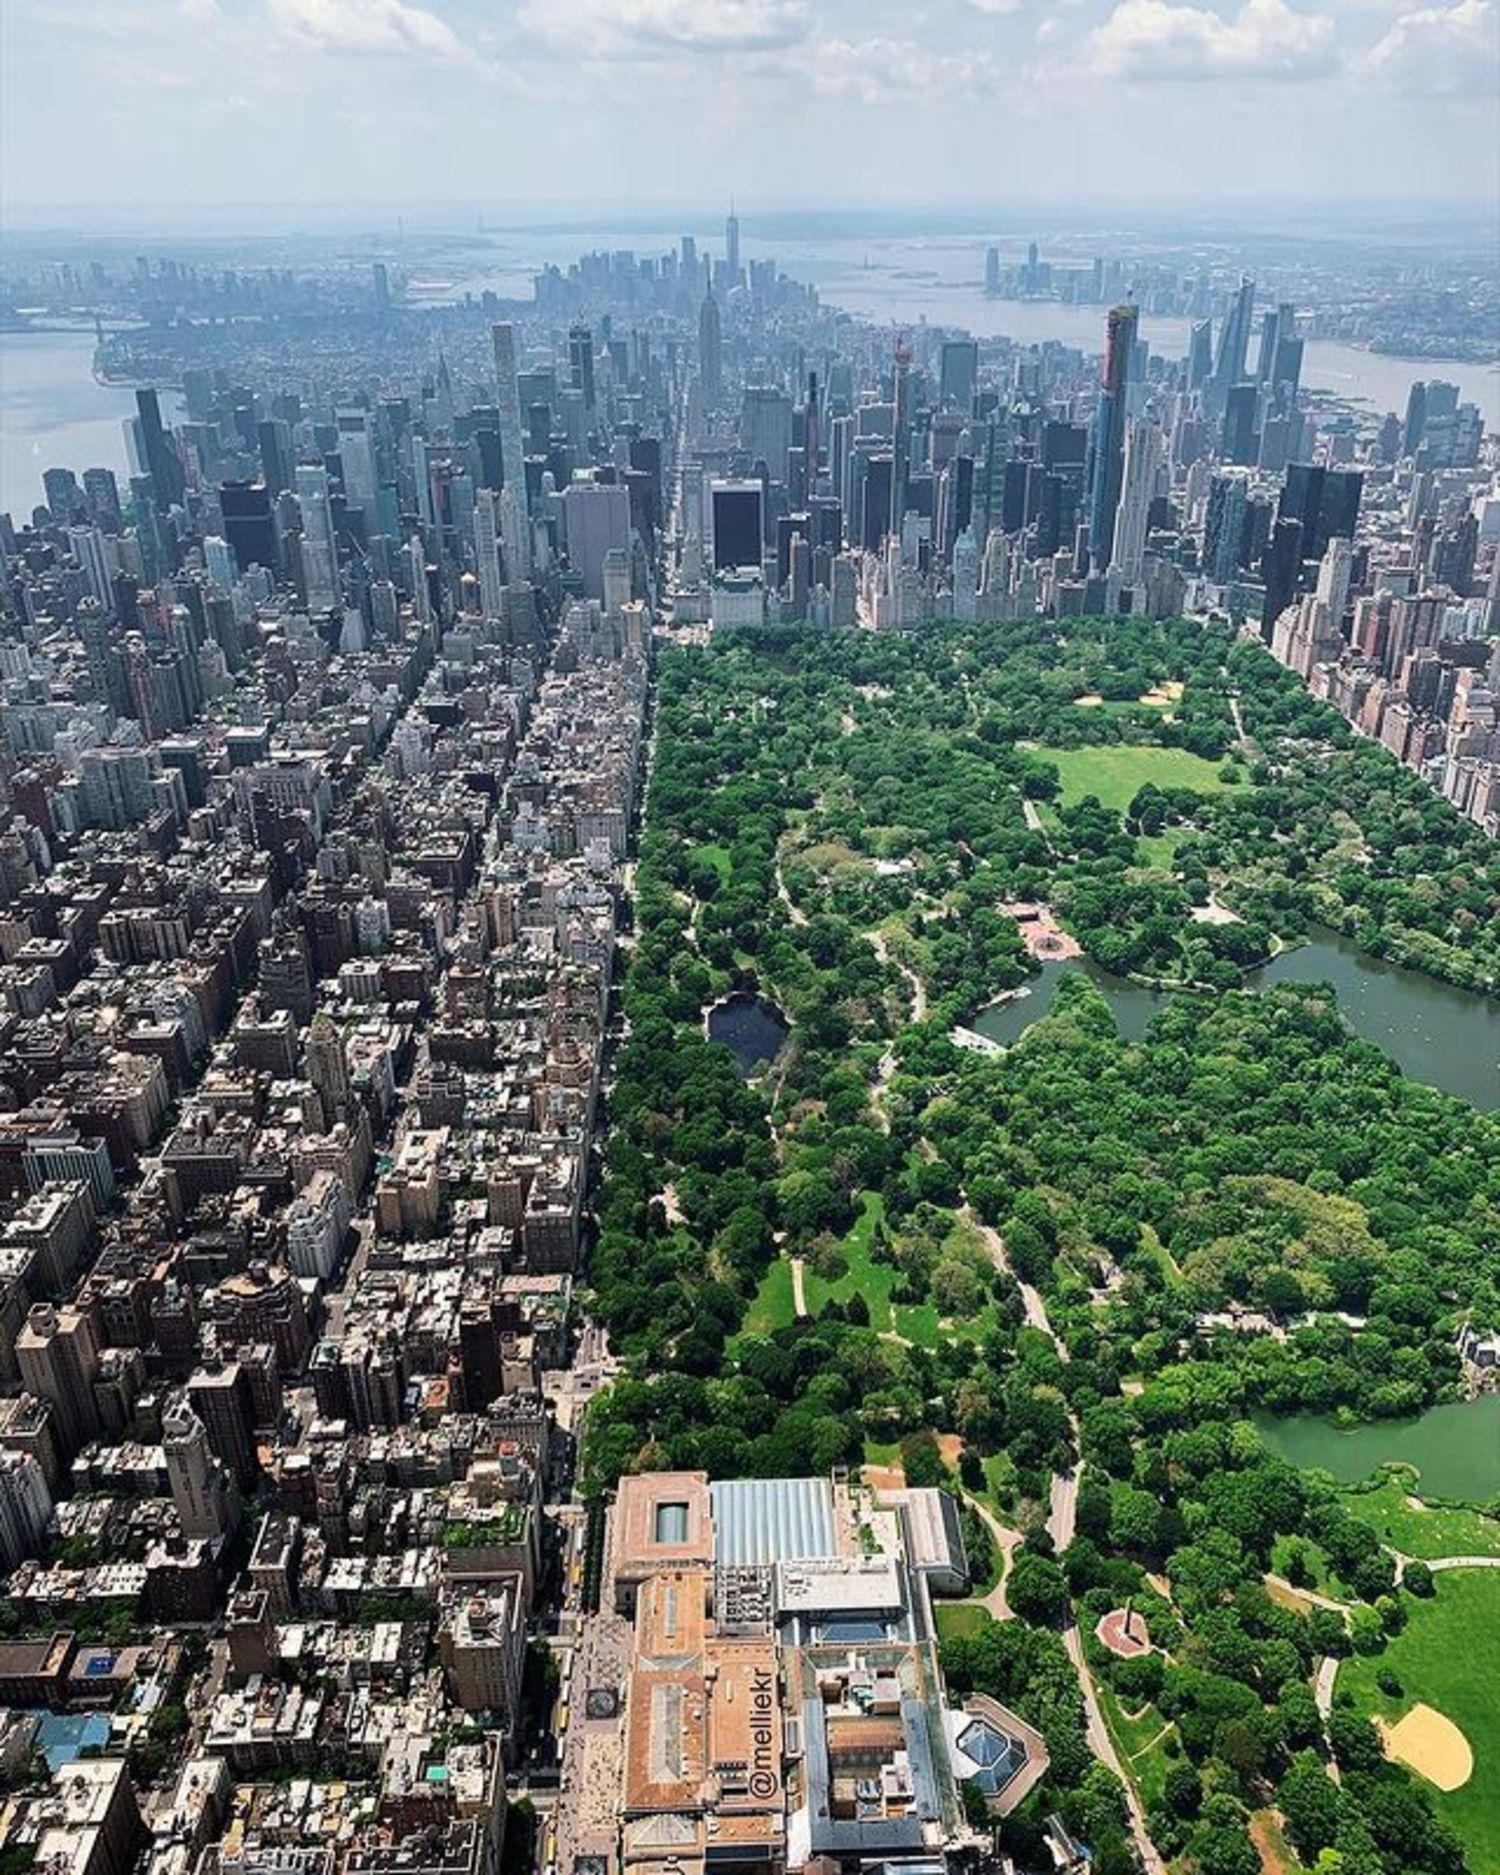 Upper East Side and Central Park, Manhattan